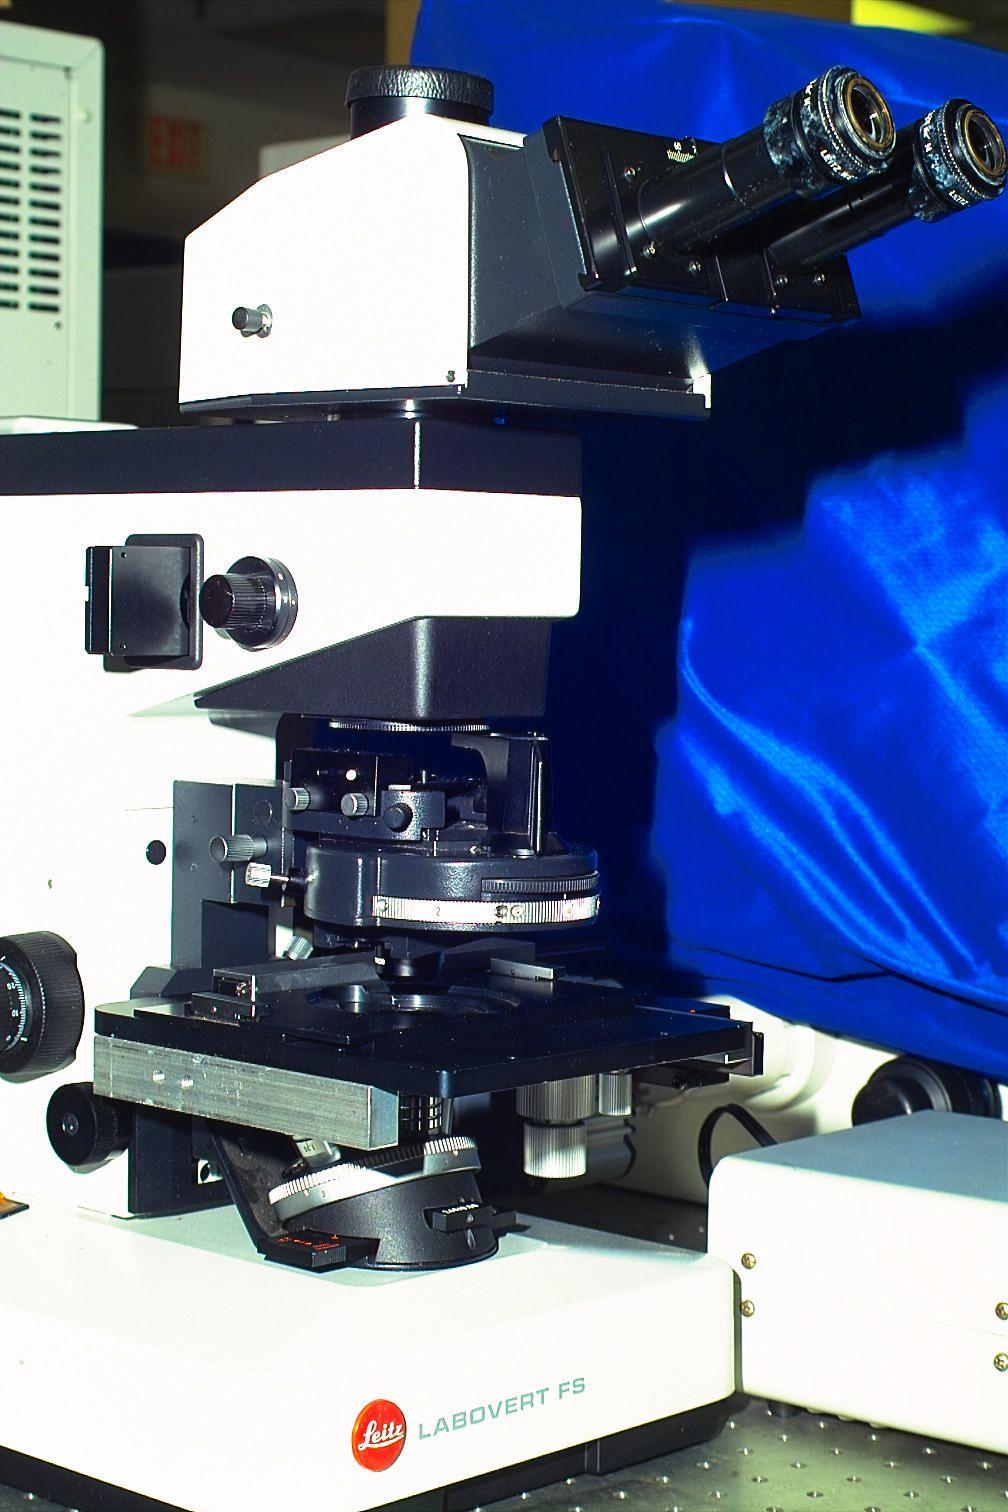 LEITZ DIC LABOVERT FS INVERTED MICROSCOPE FOR MANIPULATION - IVF LIVE CELL STUDIES